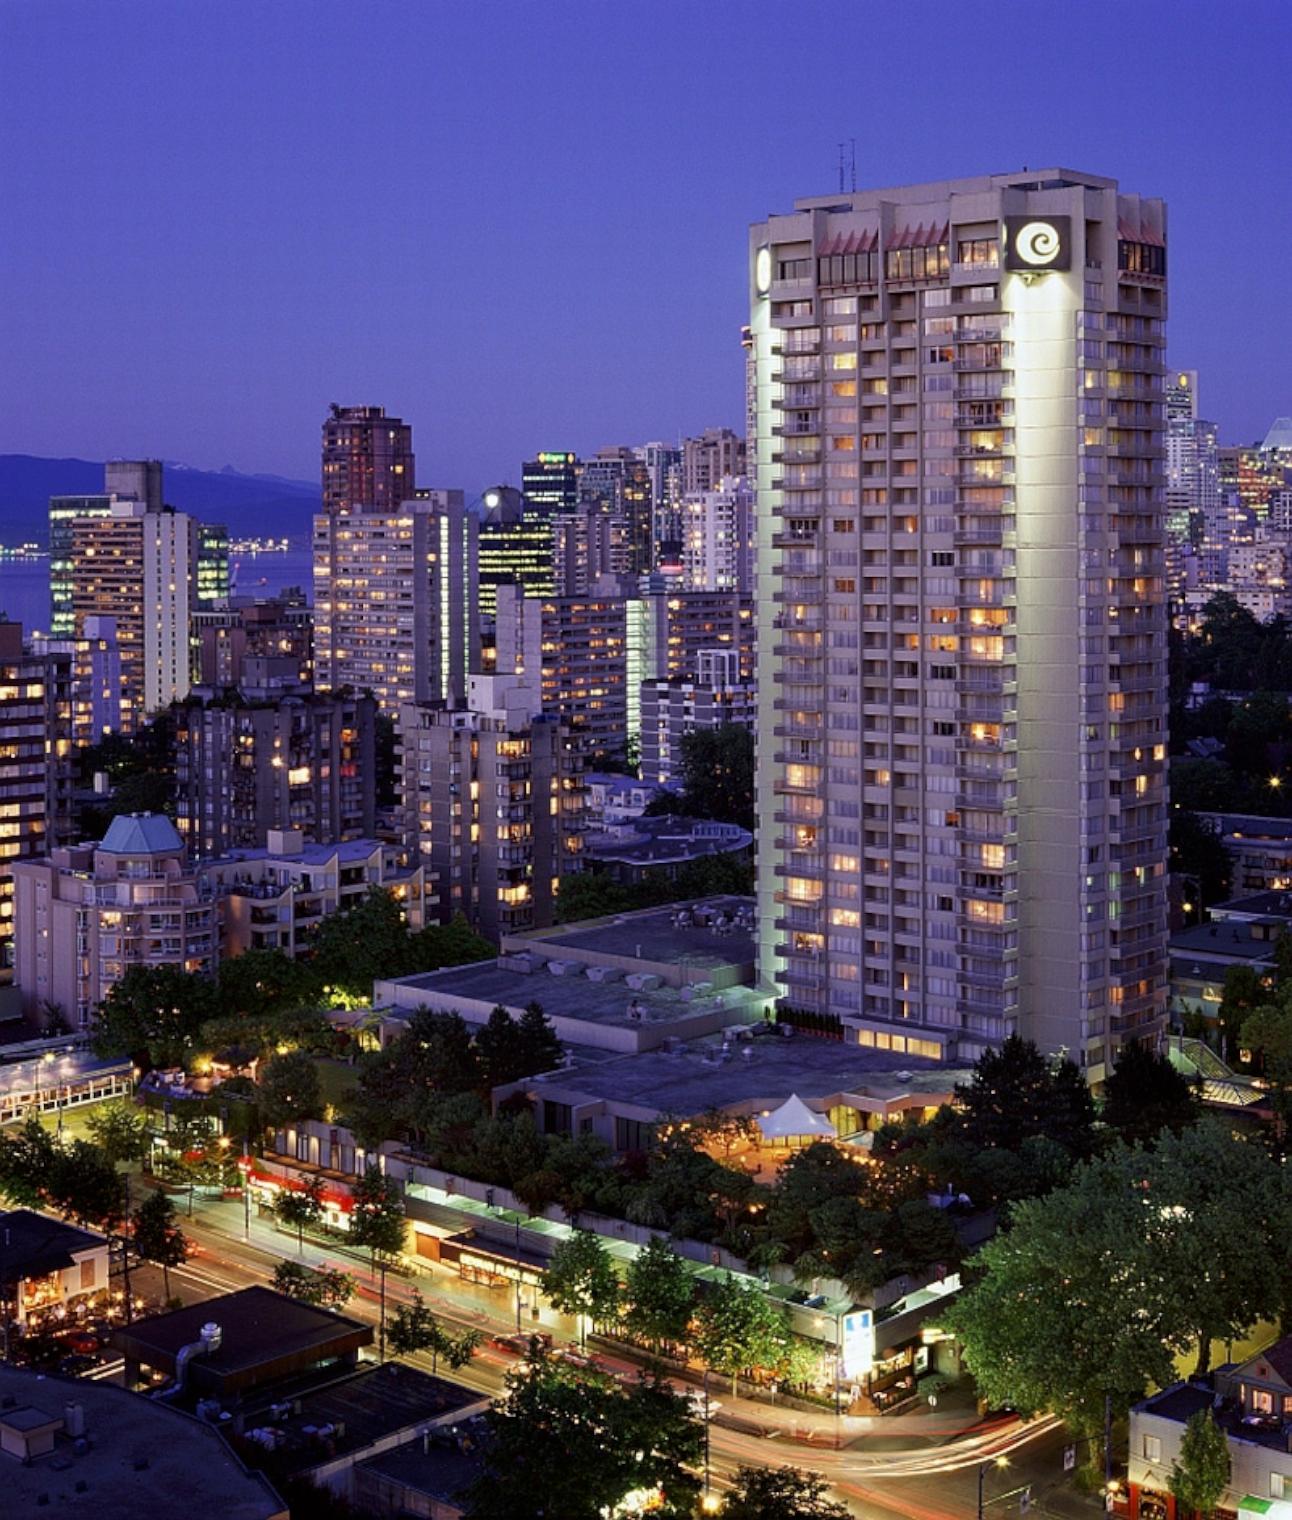 Vancouver Bc Canada: Coast Plaza Suites - Vancouver